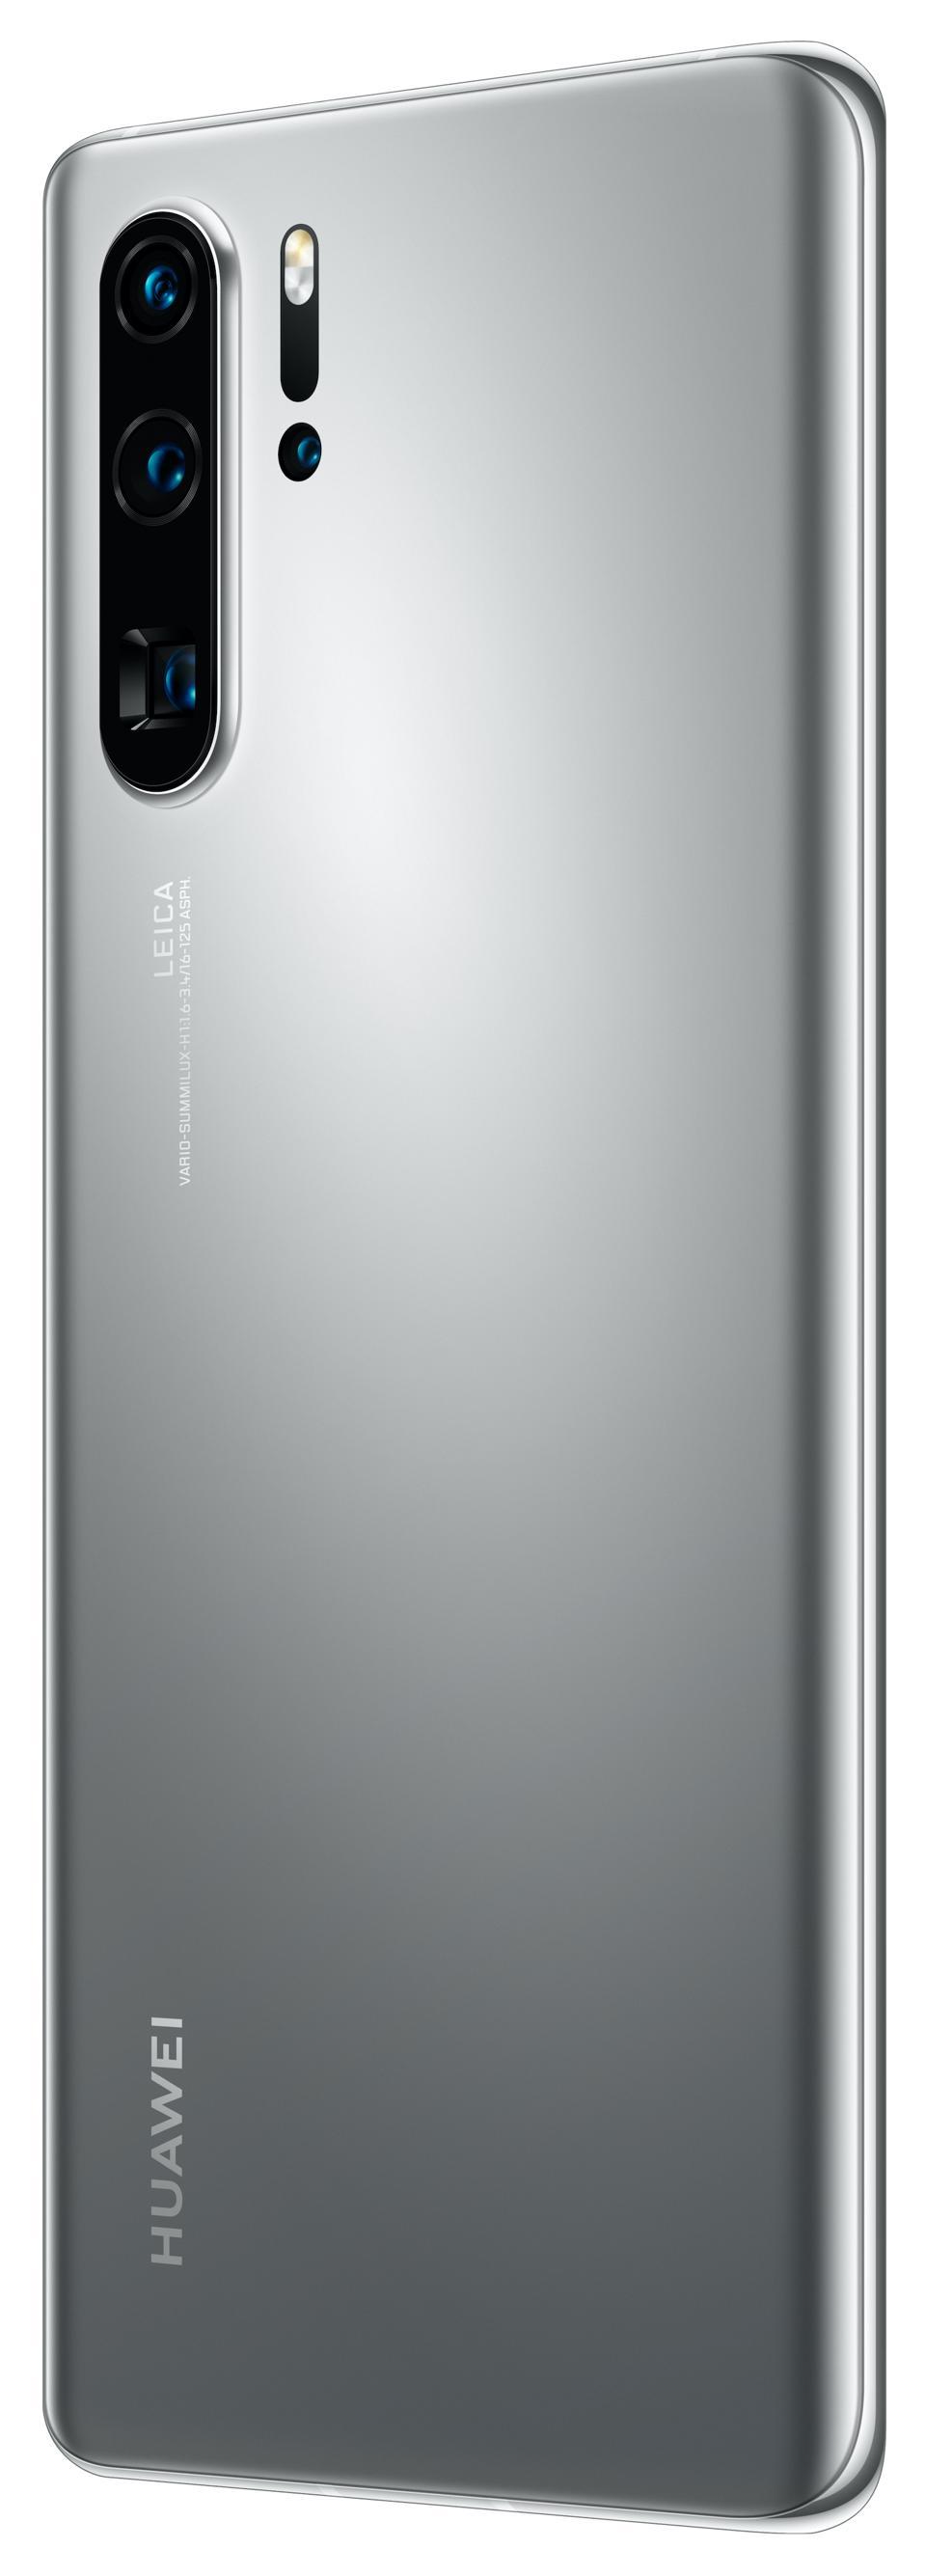 HUAWEI P30 Pro NEW EDITION Silverfrost (1) copy